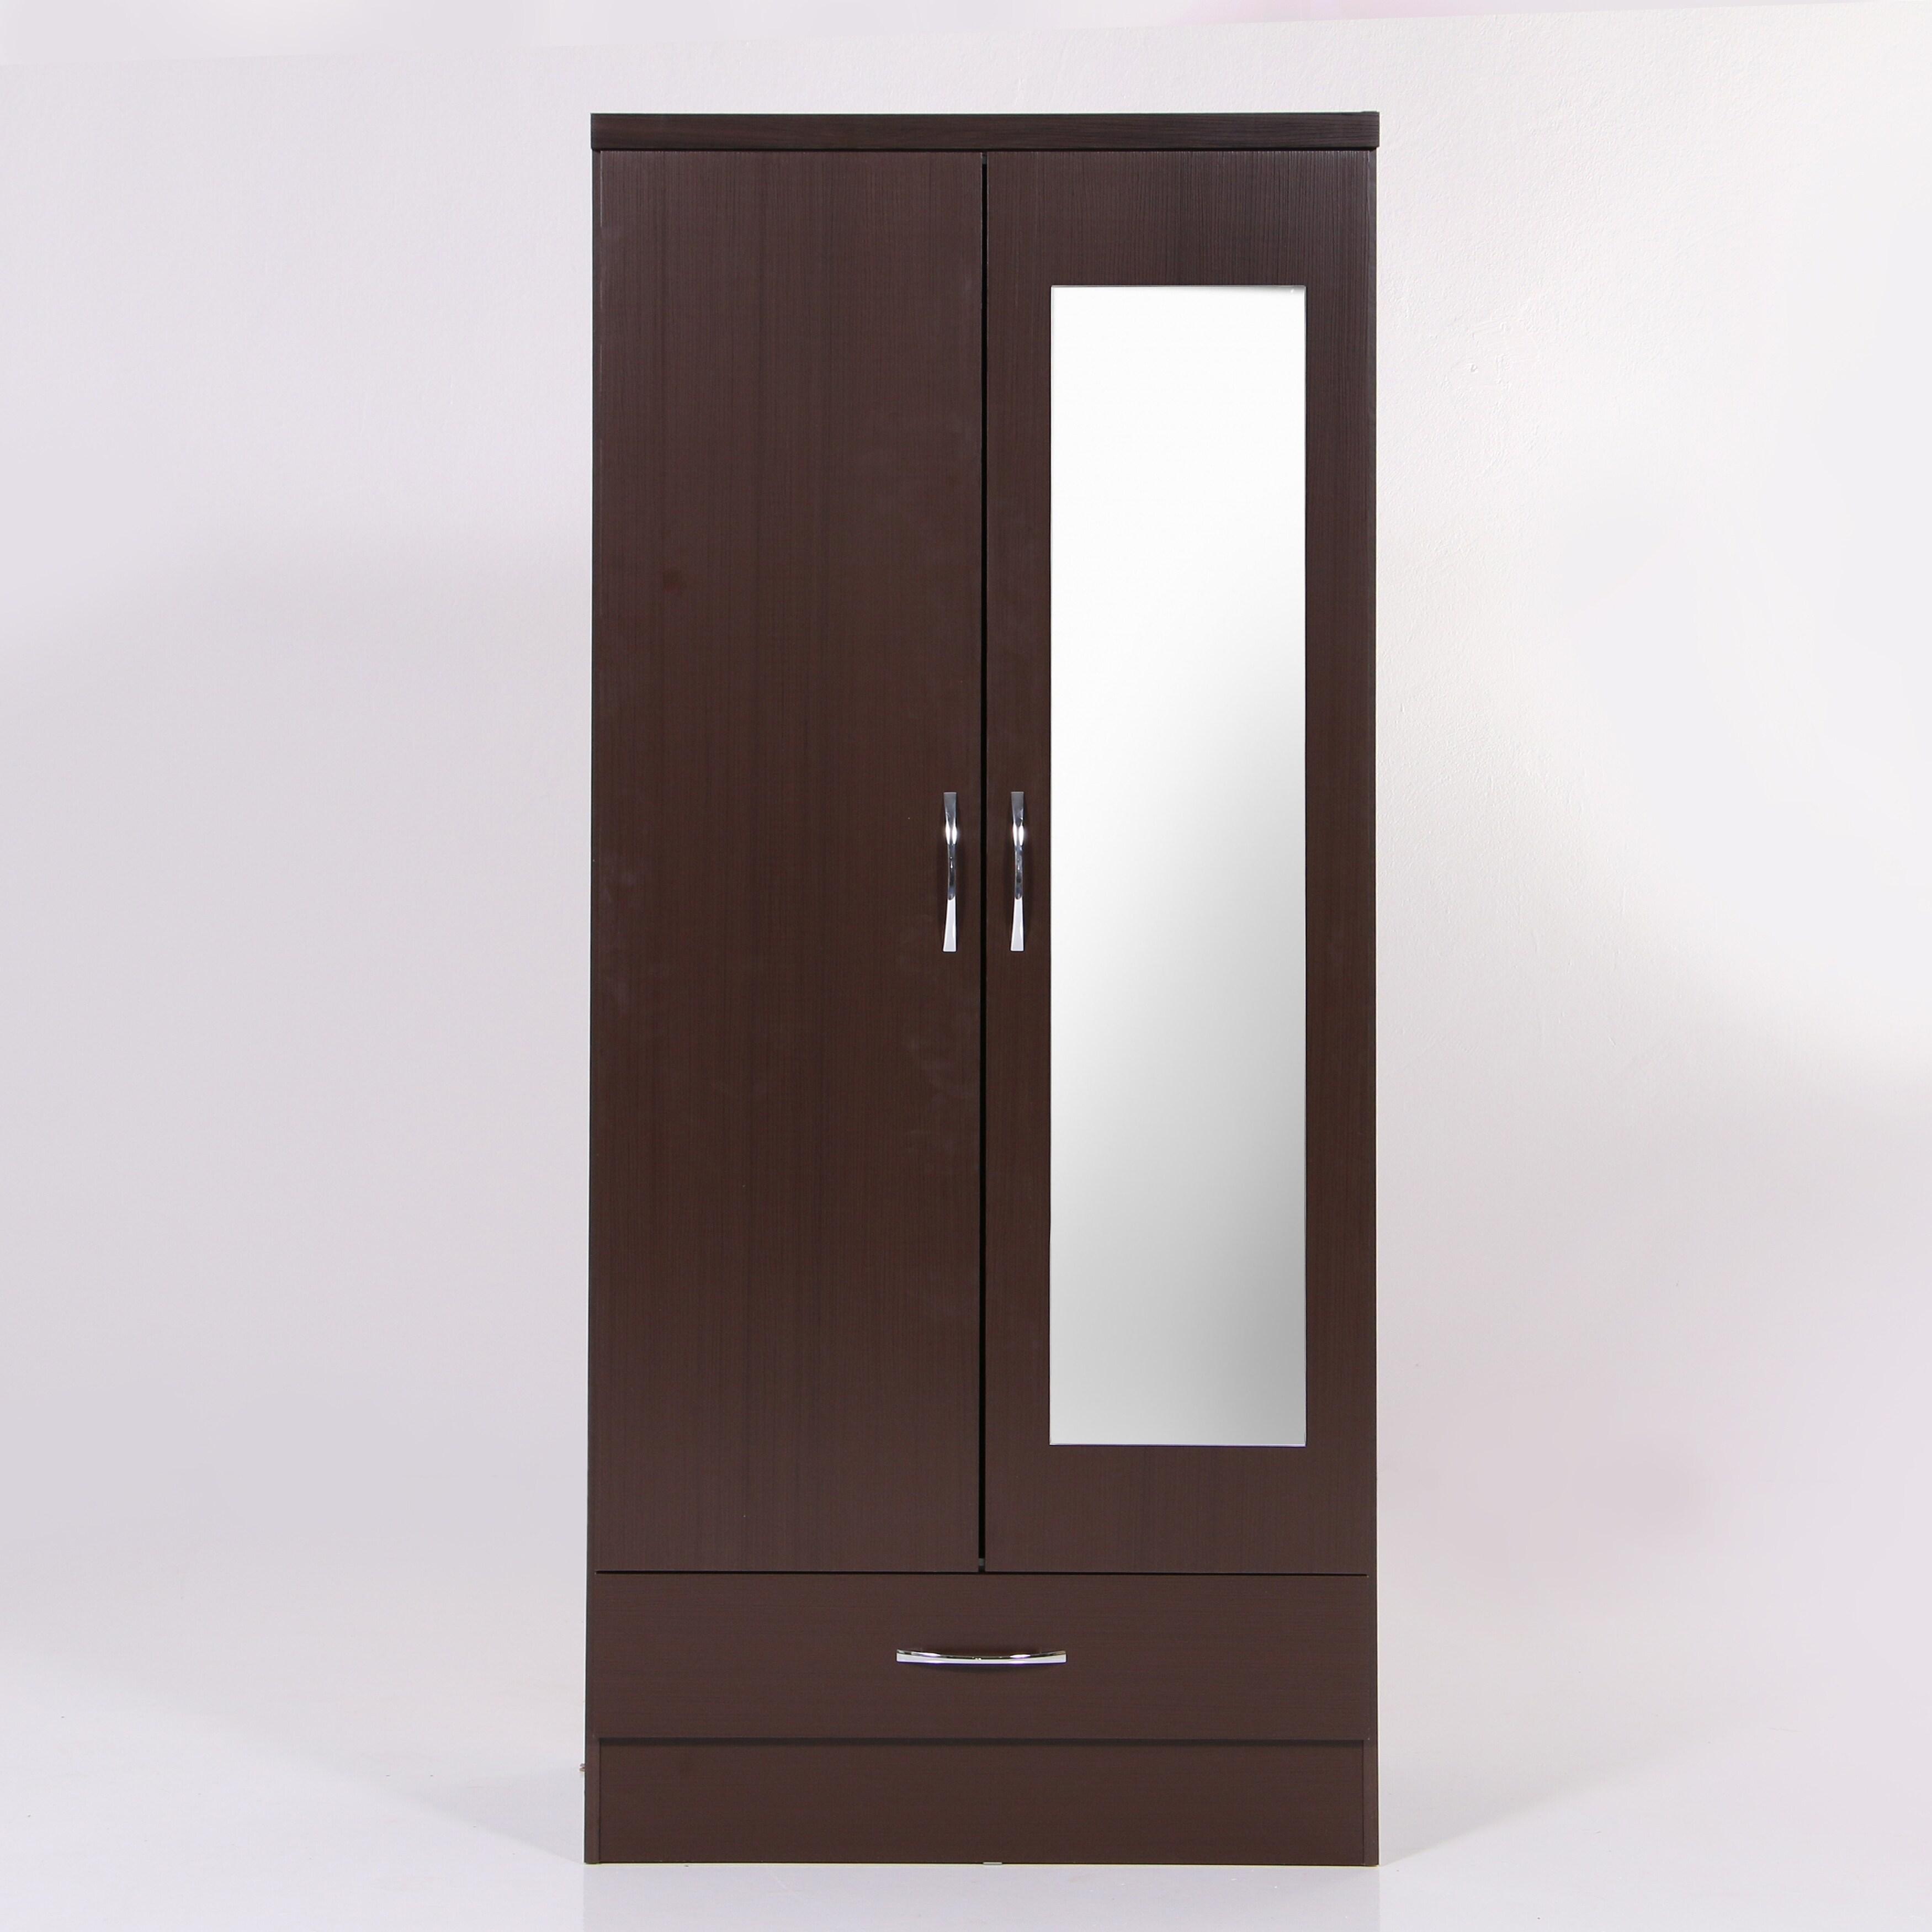 Nevada Mirrored 2 Door Wardrobe Armoire Free Shipping Today 28227501